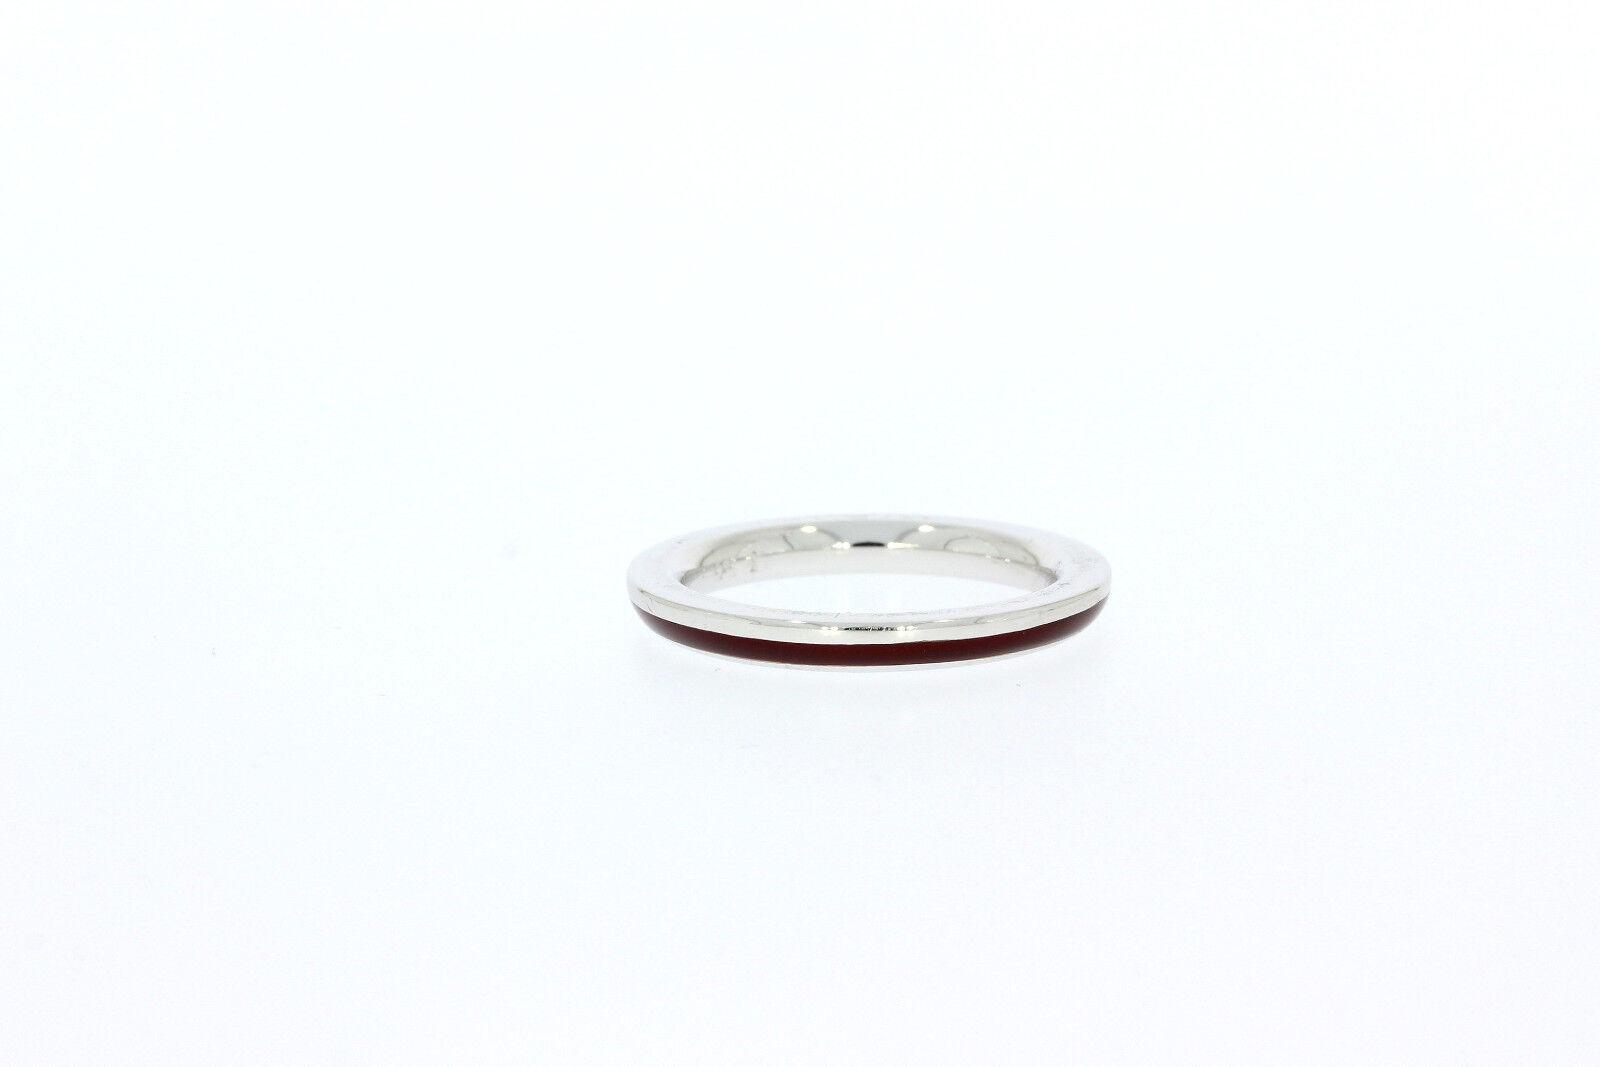 9104-585er whitegoldring Emailiert Ringgroße 56 Breite 2,9 mm Gewicht 5,5 Gramm